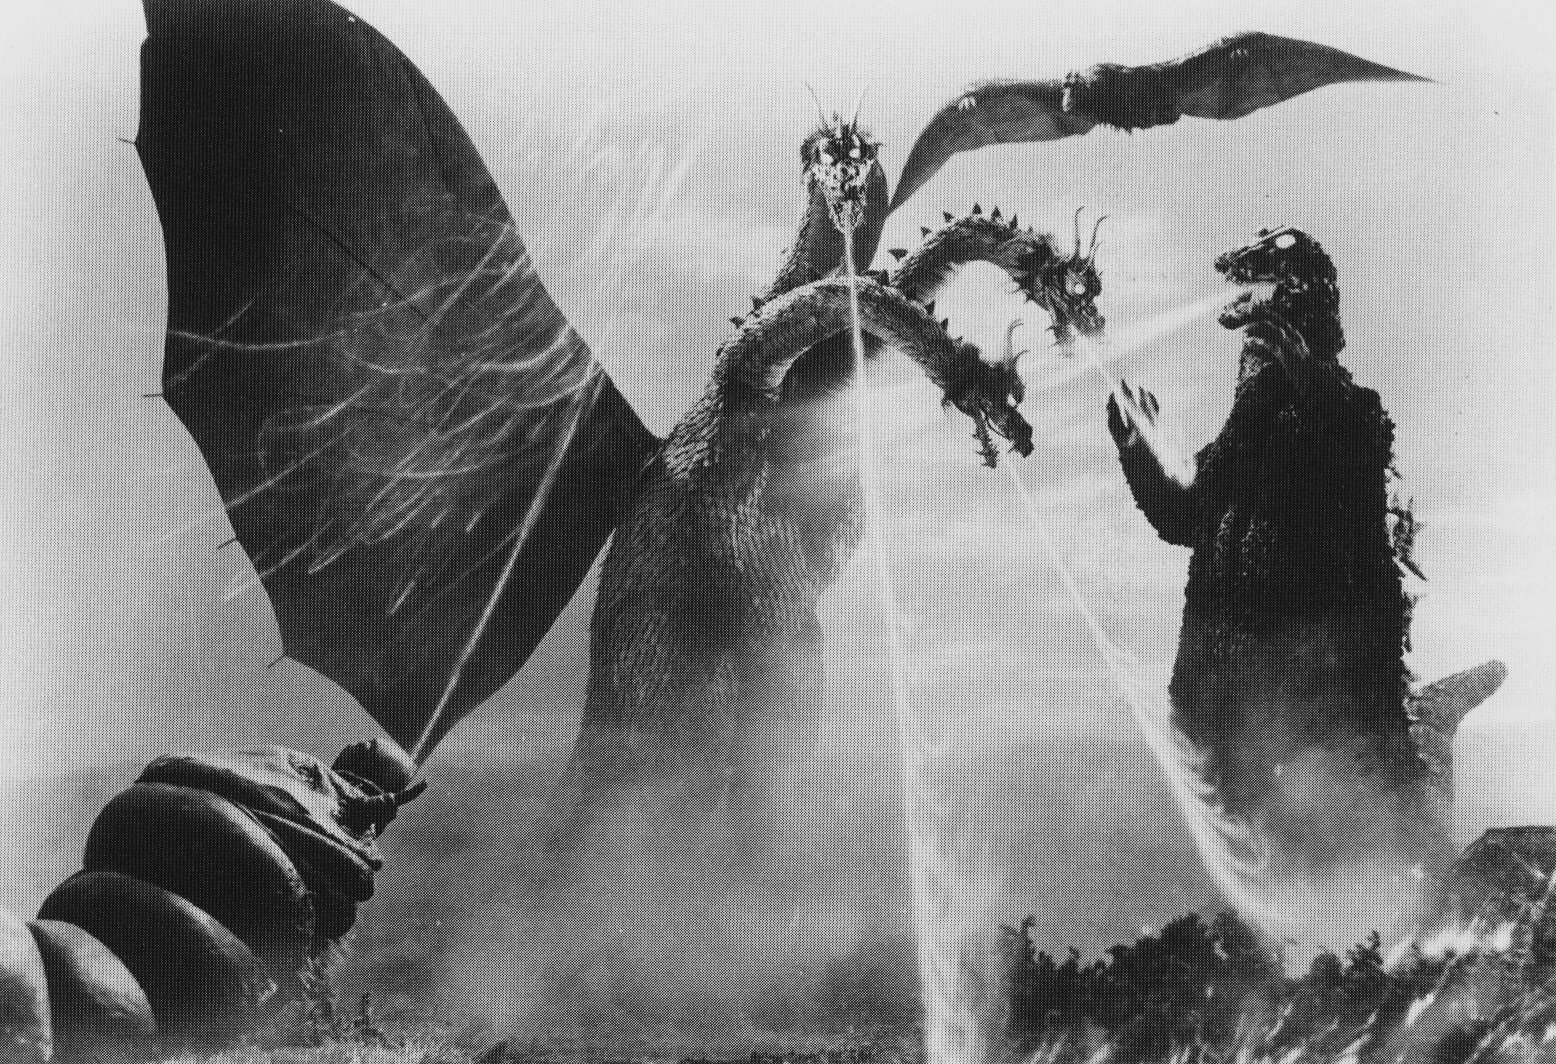 GT3HM_-_Godzilla,_Rodan_and_Mothra_vs._King_Ghidorah_Artwork